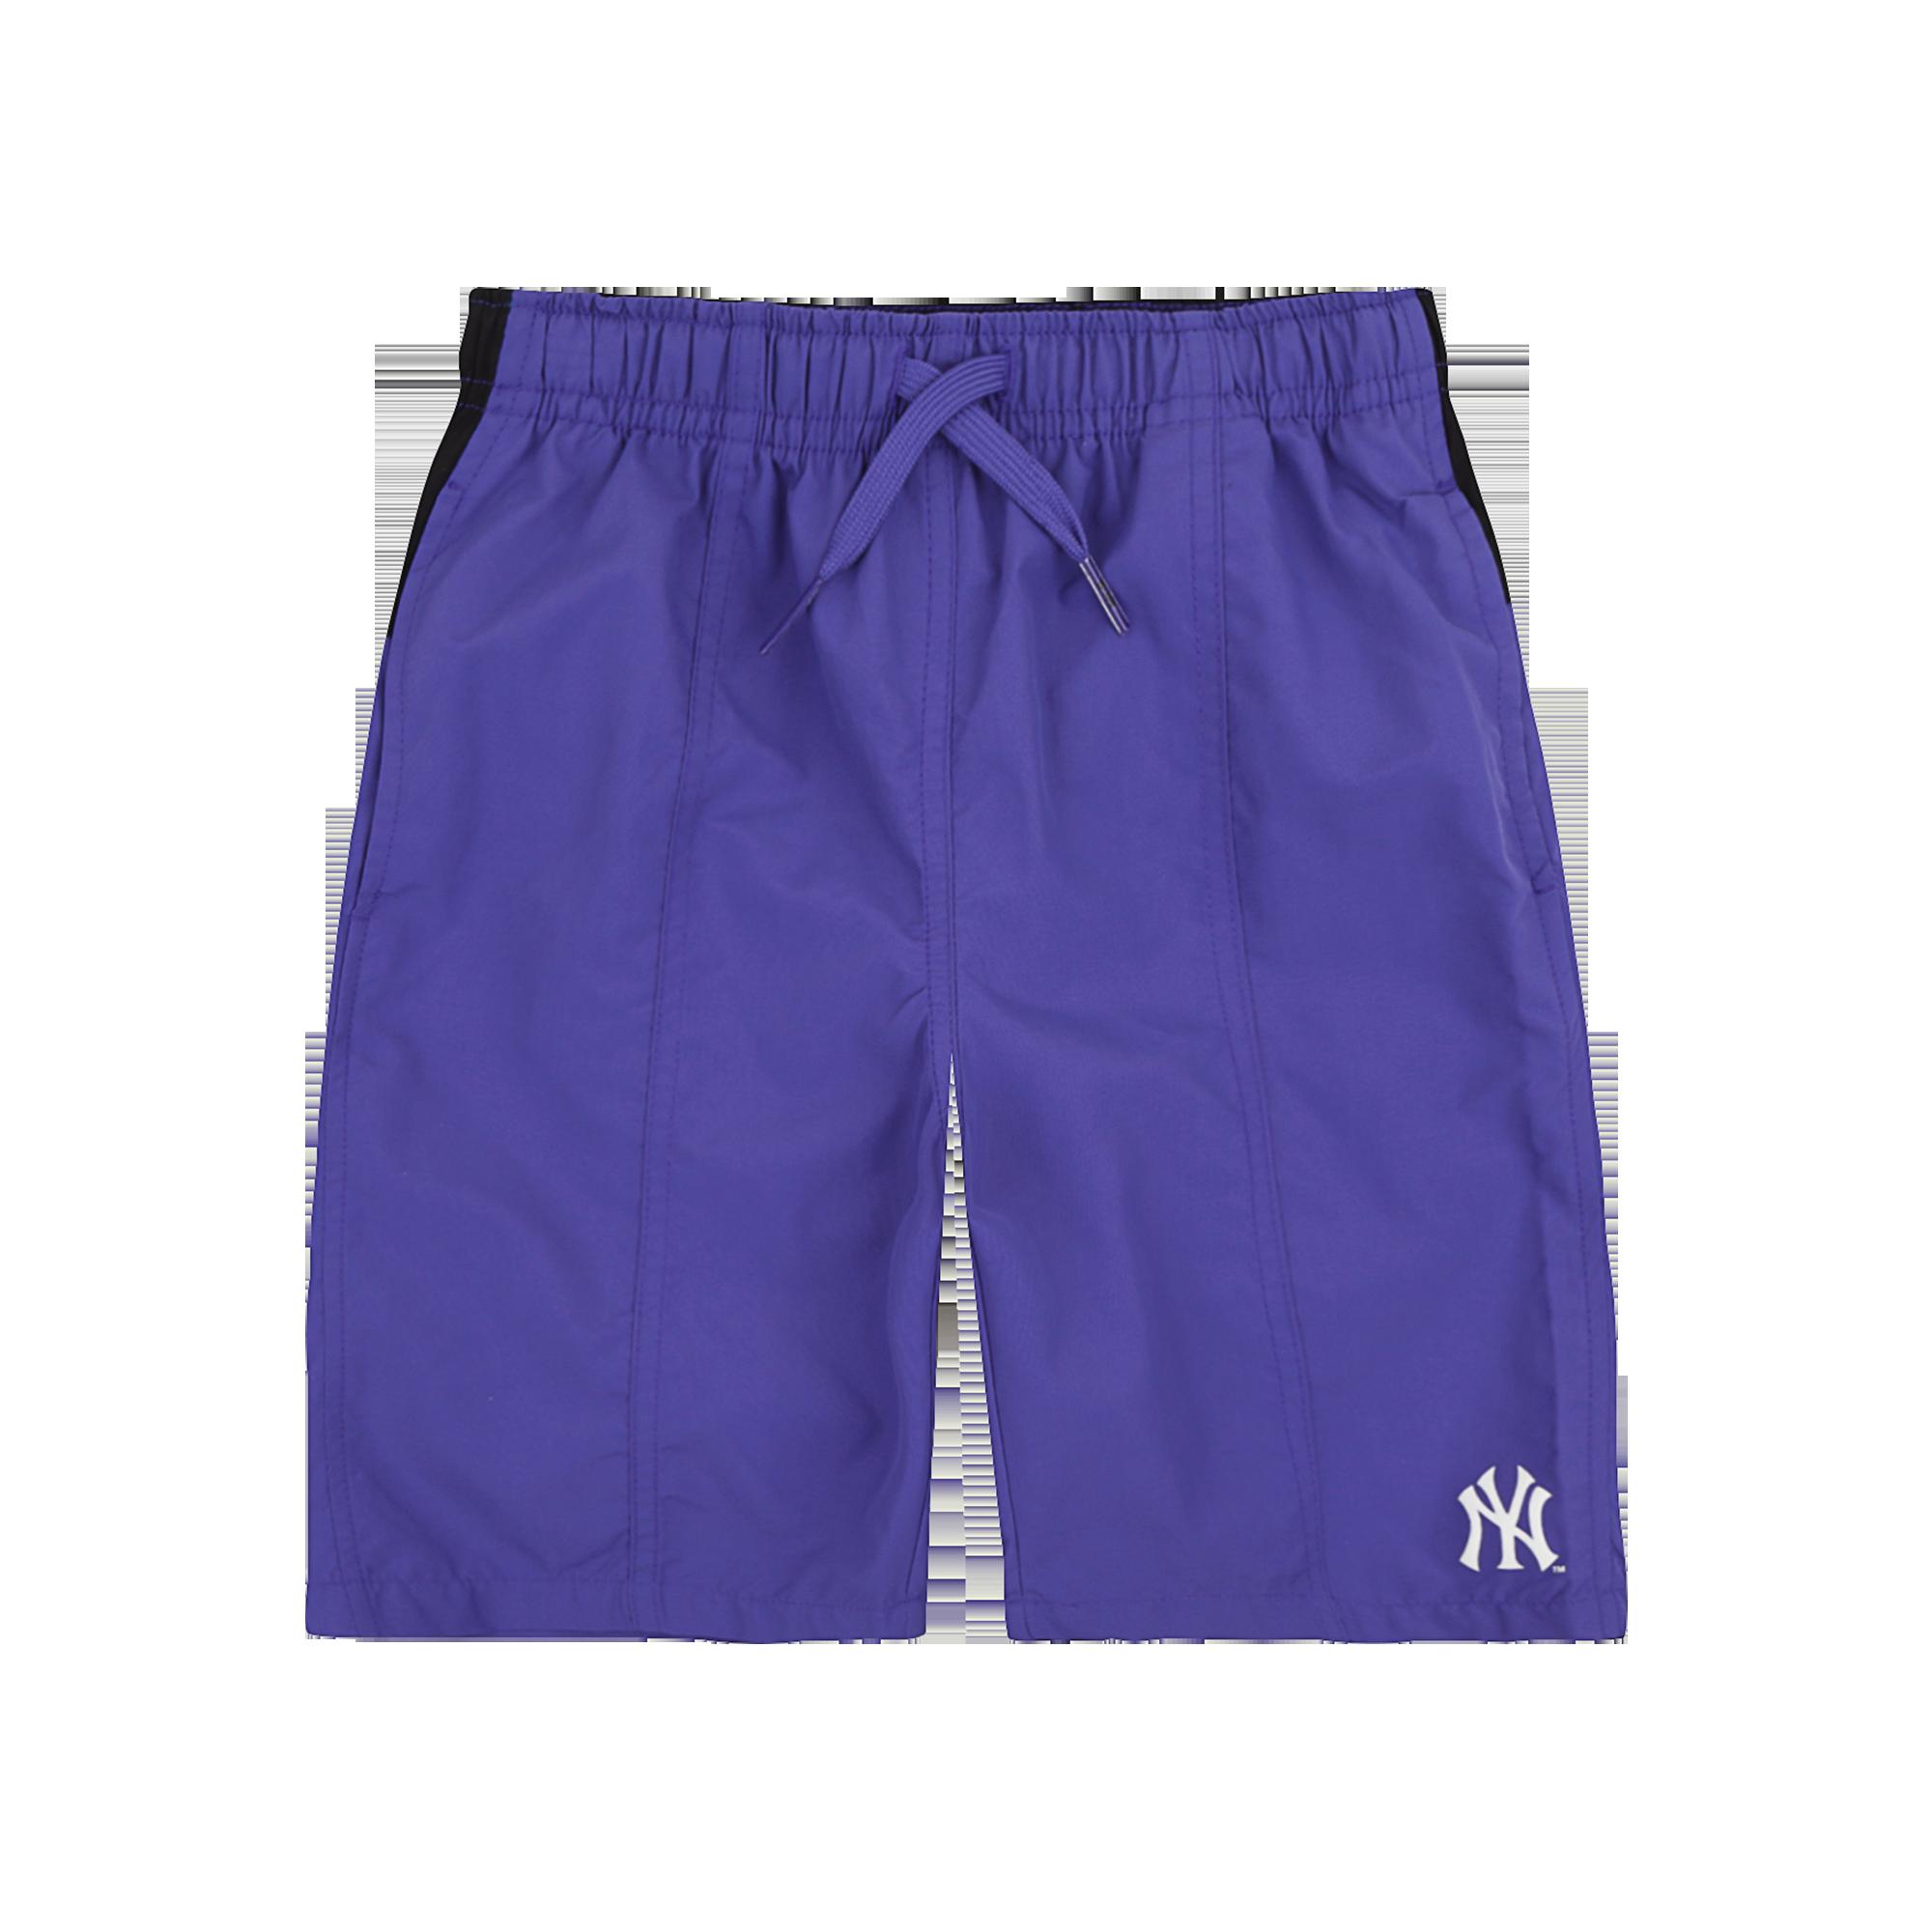 NEW YORK YANKEES LOGO POINT KNEE-LENGTH PANTS